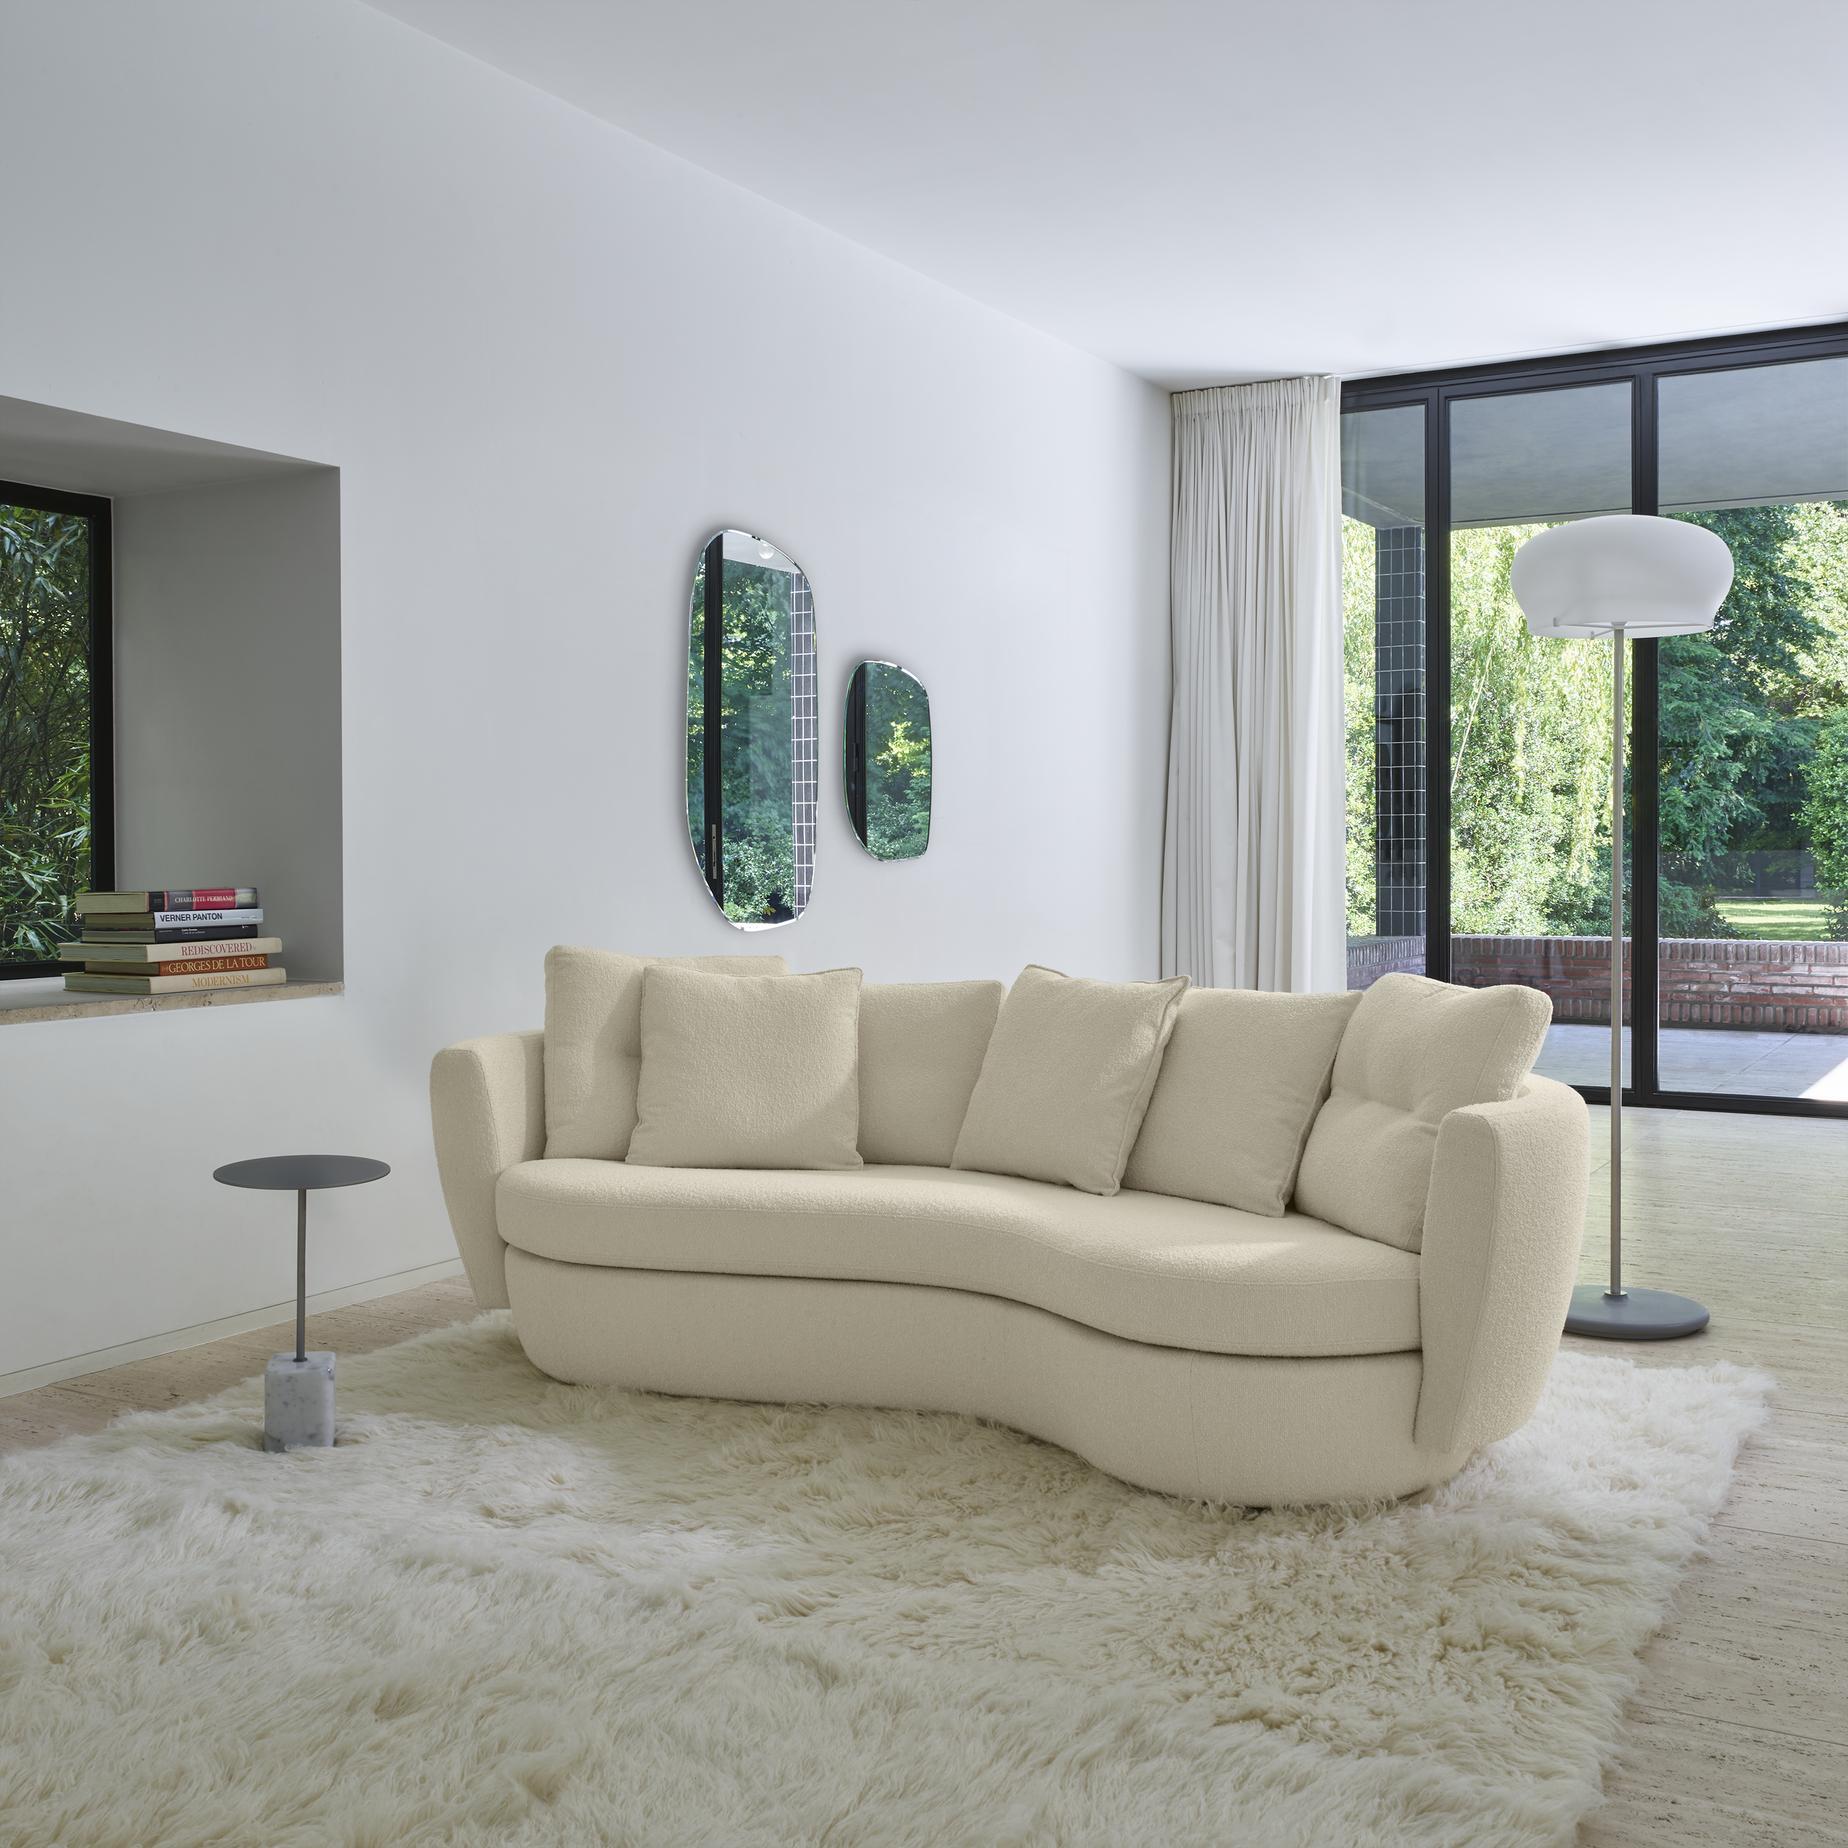 Ipanema Sofas From Designer Dir